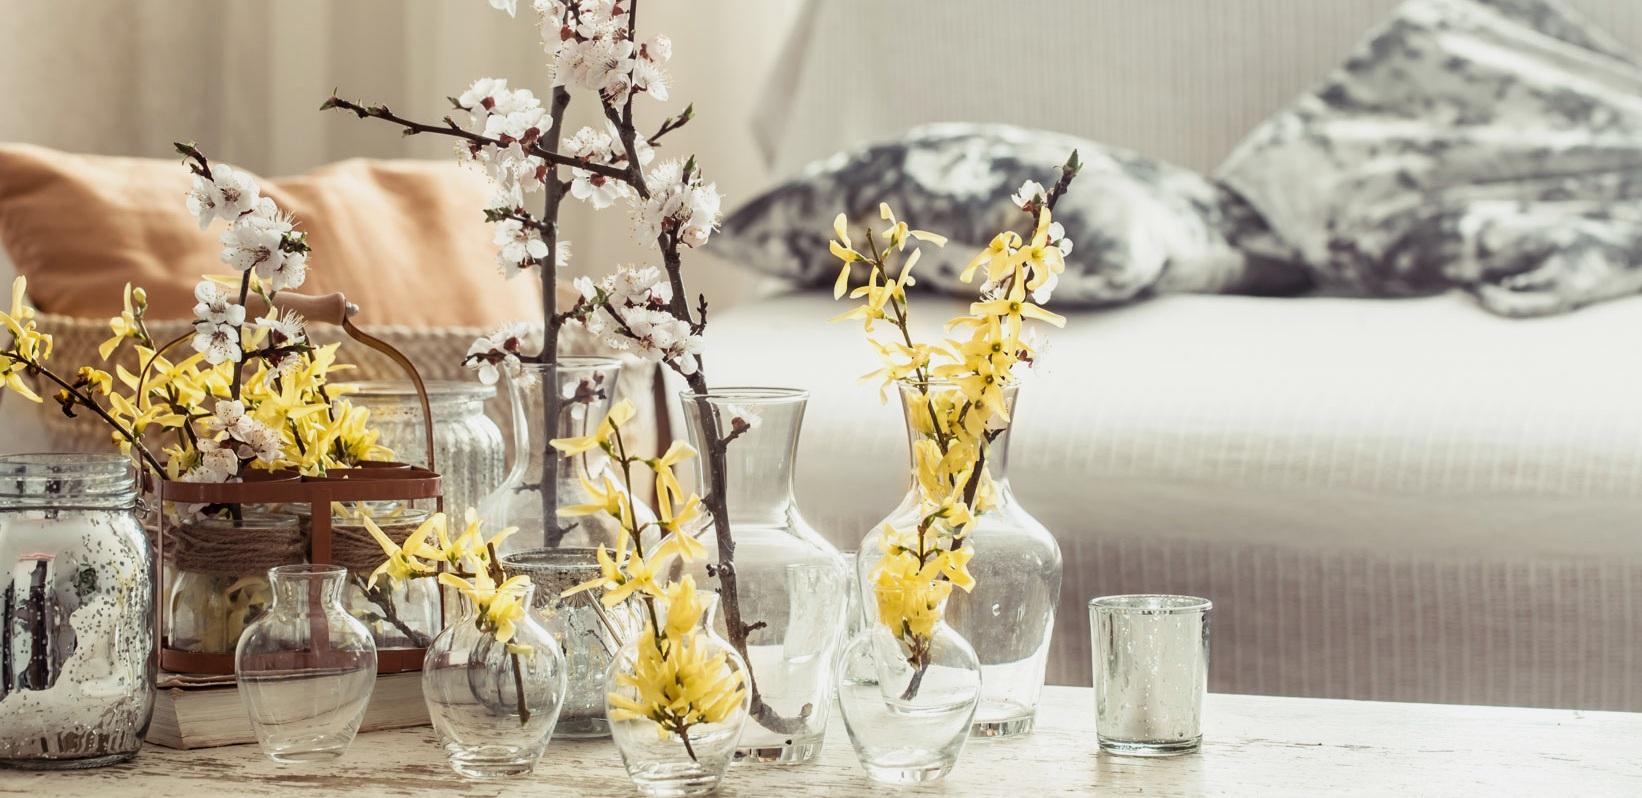 Skin Needling decorative table